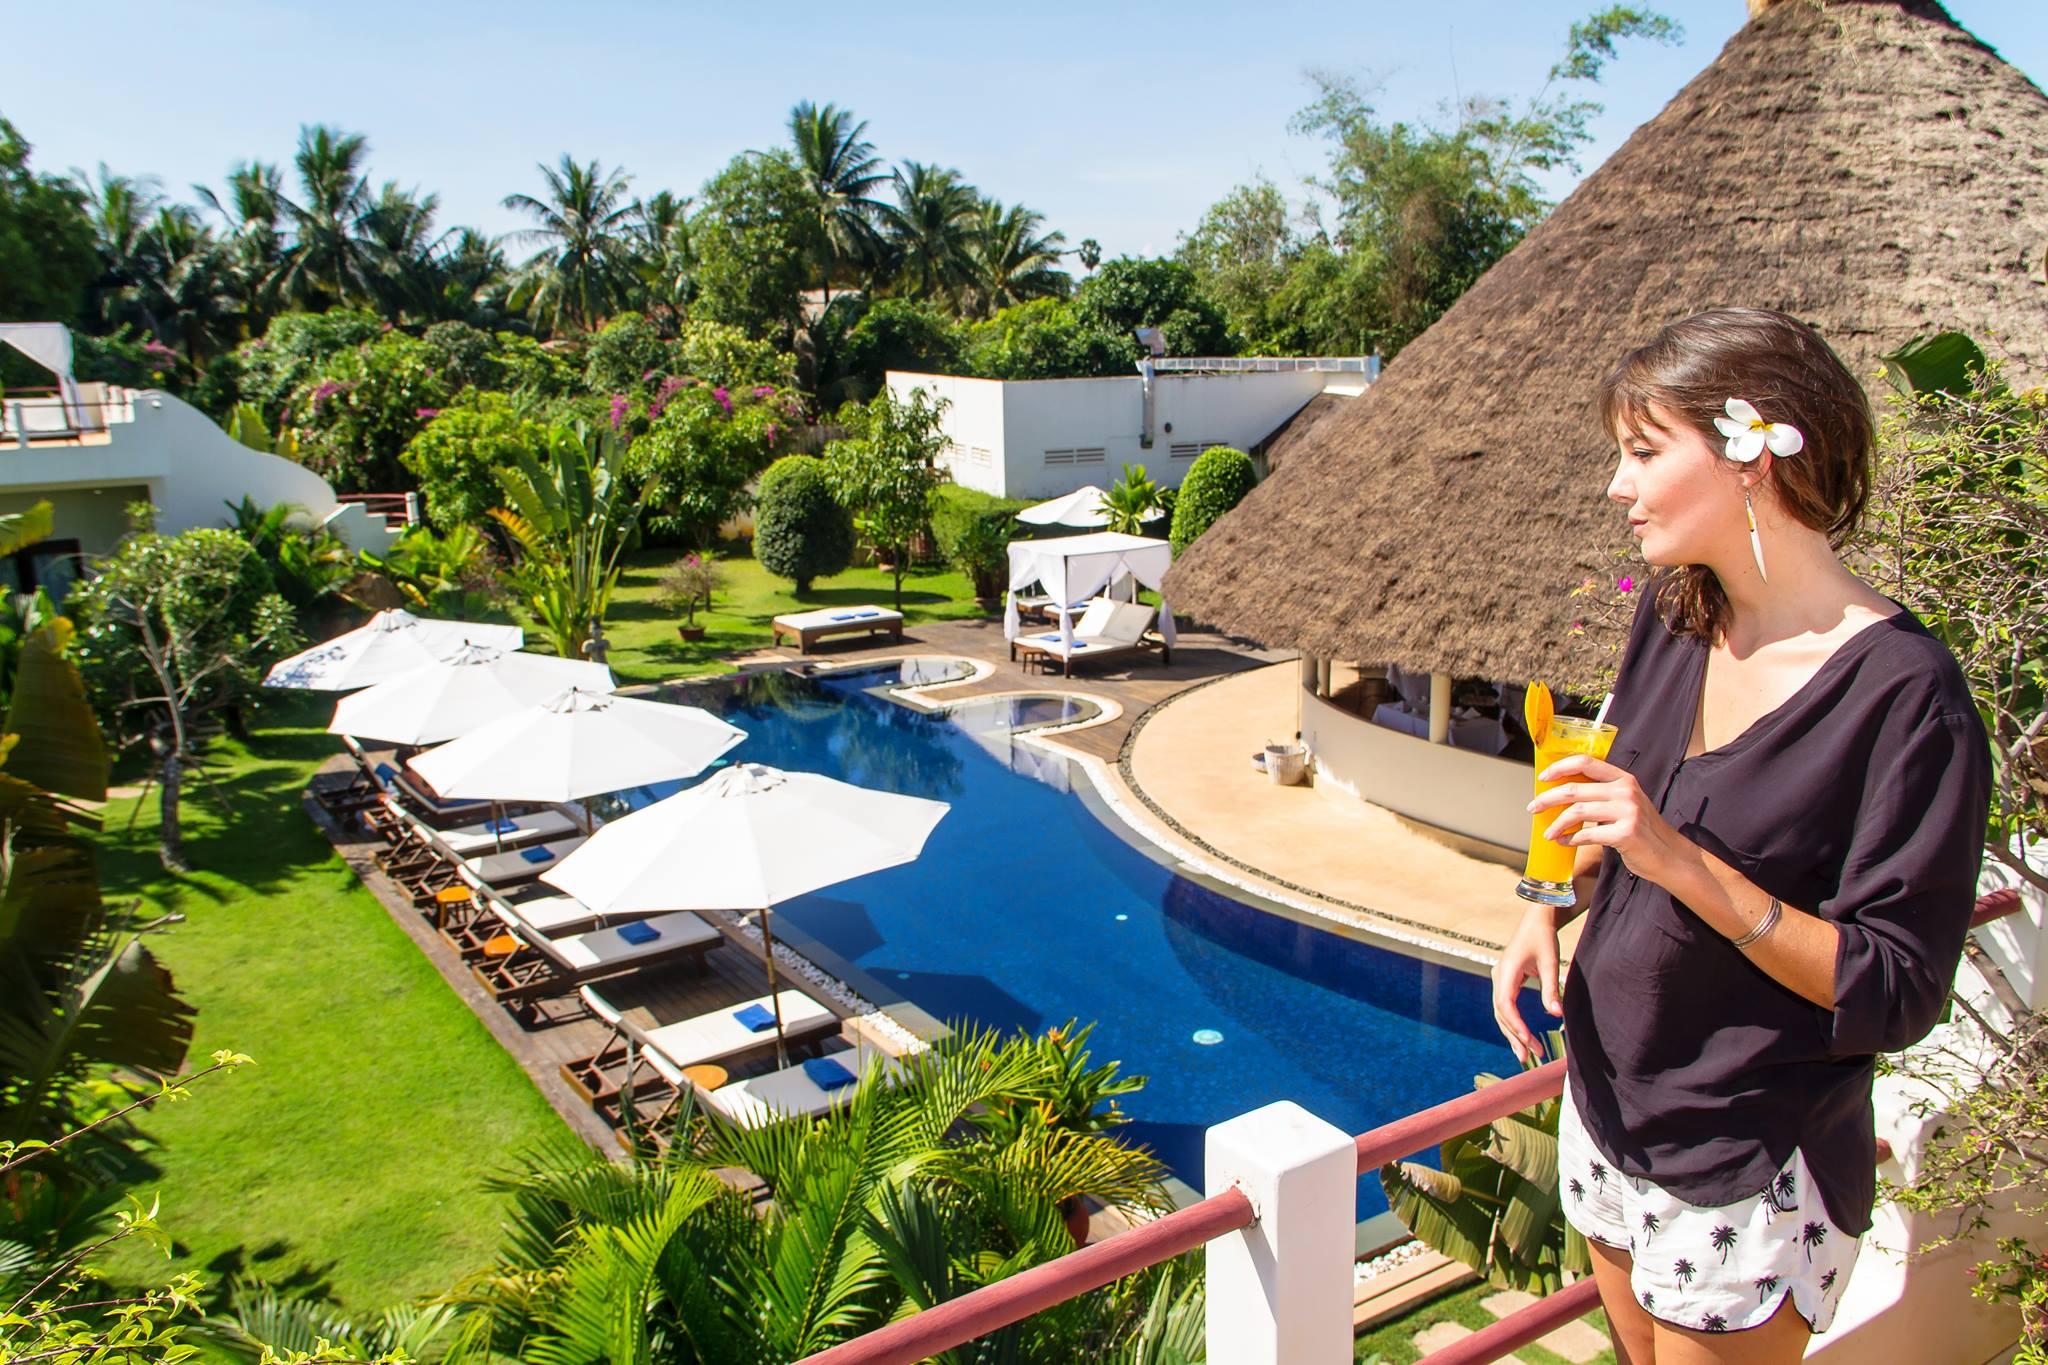 navutu-dreams-resort-and-wellness-retreat-center-krong-siem-reap-cambodia-7